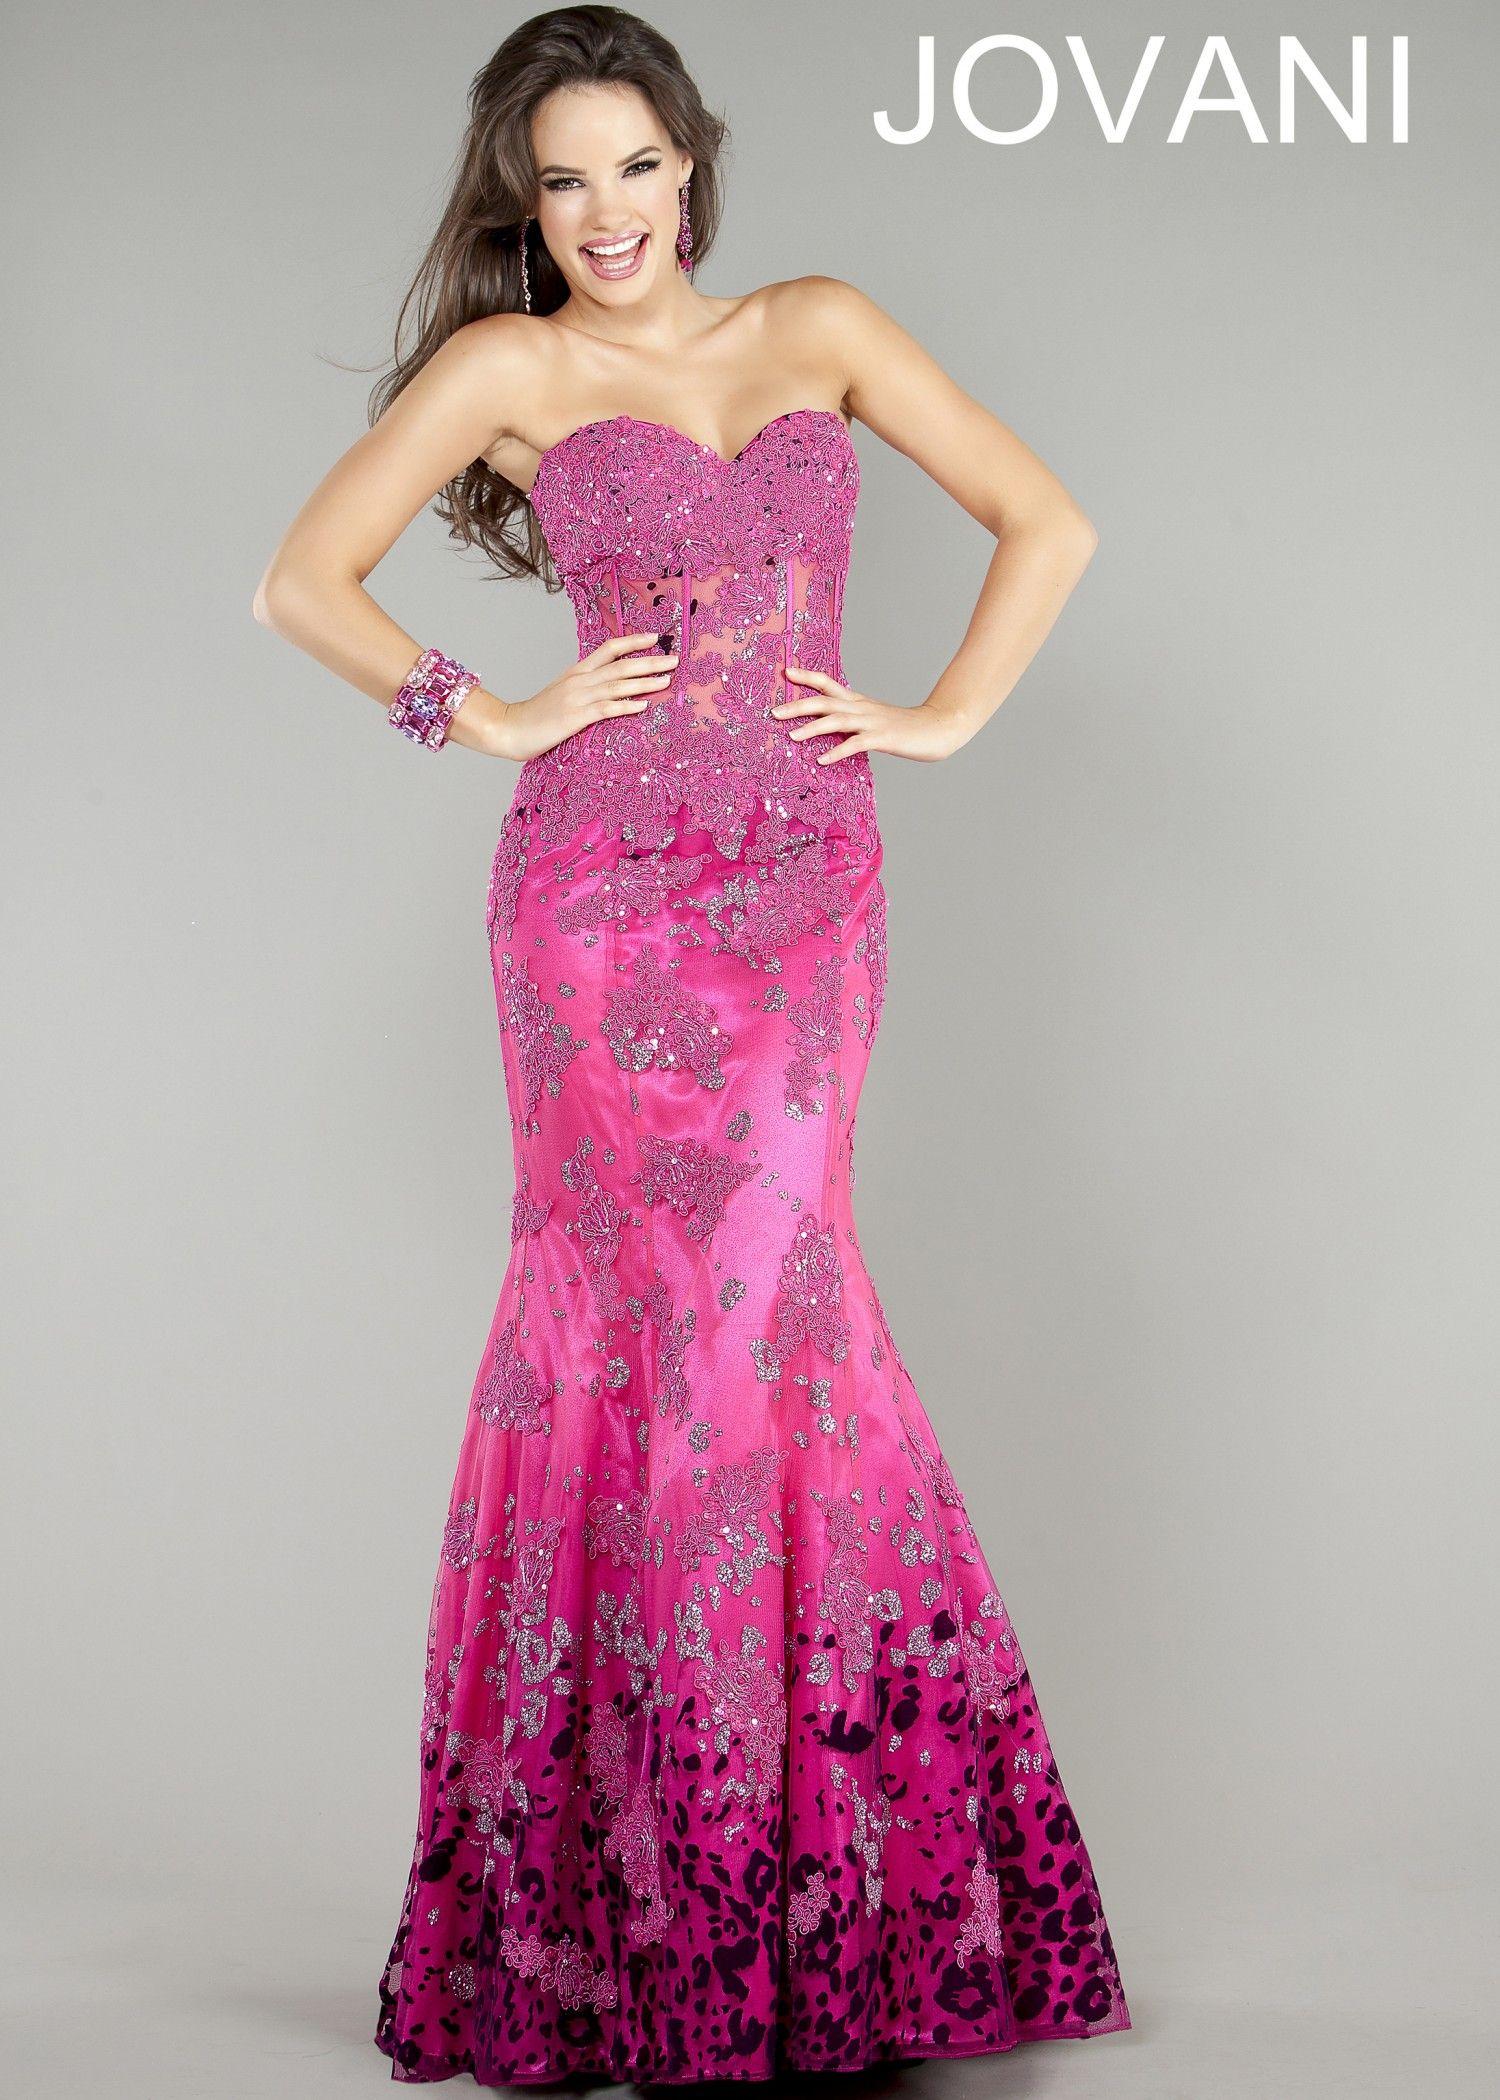 Increíble Vestidos De Fiesta Orland Park Il Modelo - Colección de ...